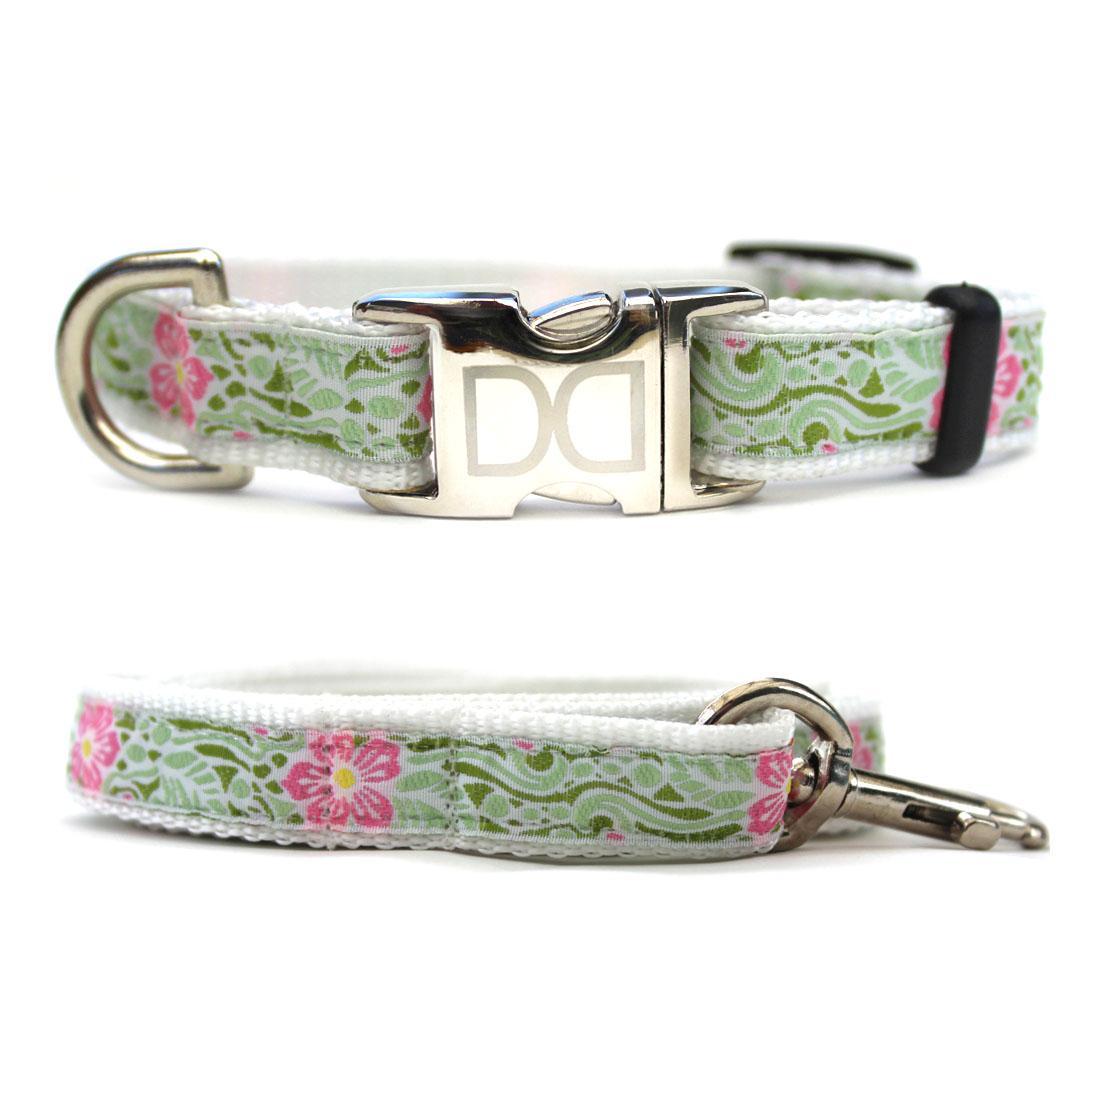 Maui Dog Collar and Leash Set by Diva Dog